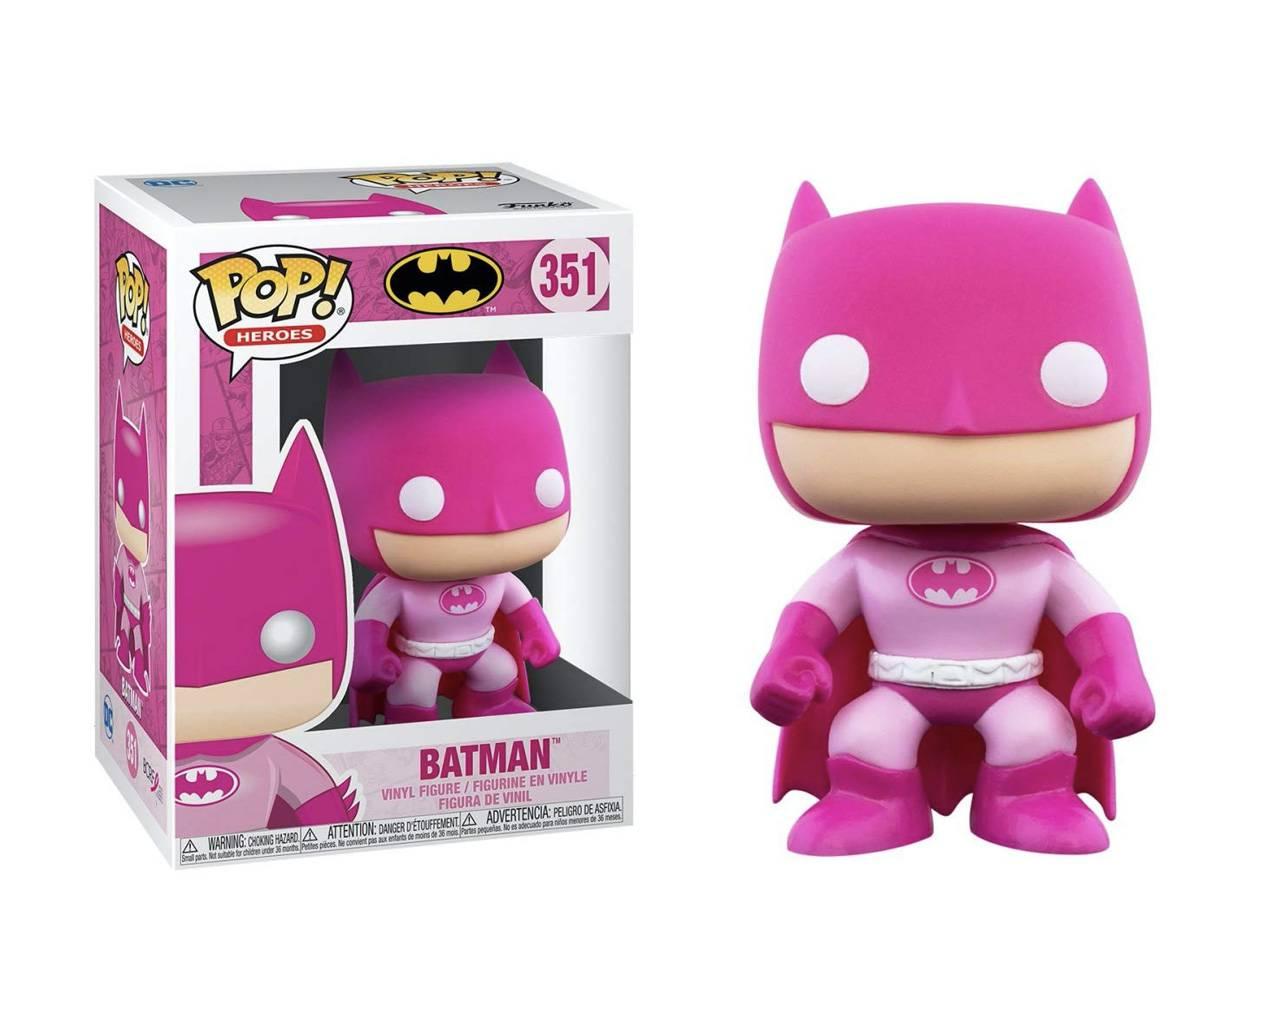 Batman (Breast Cancer Awareness) Pop! Vinyl